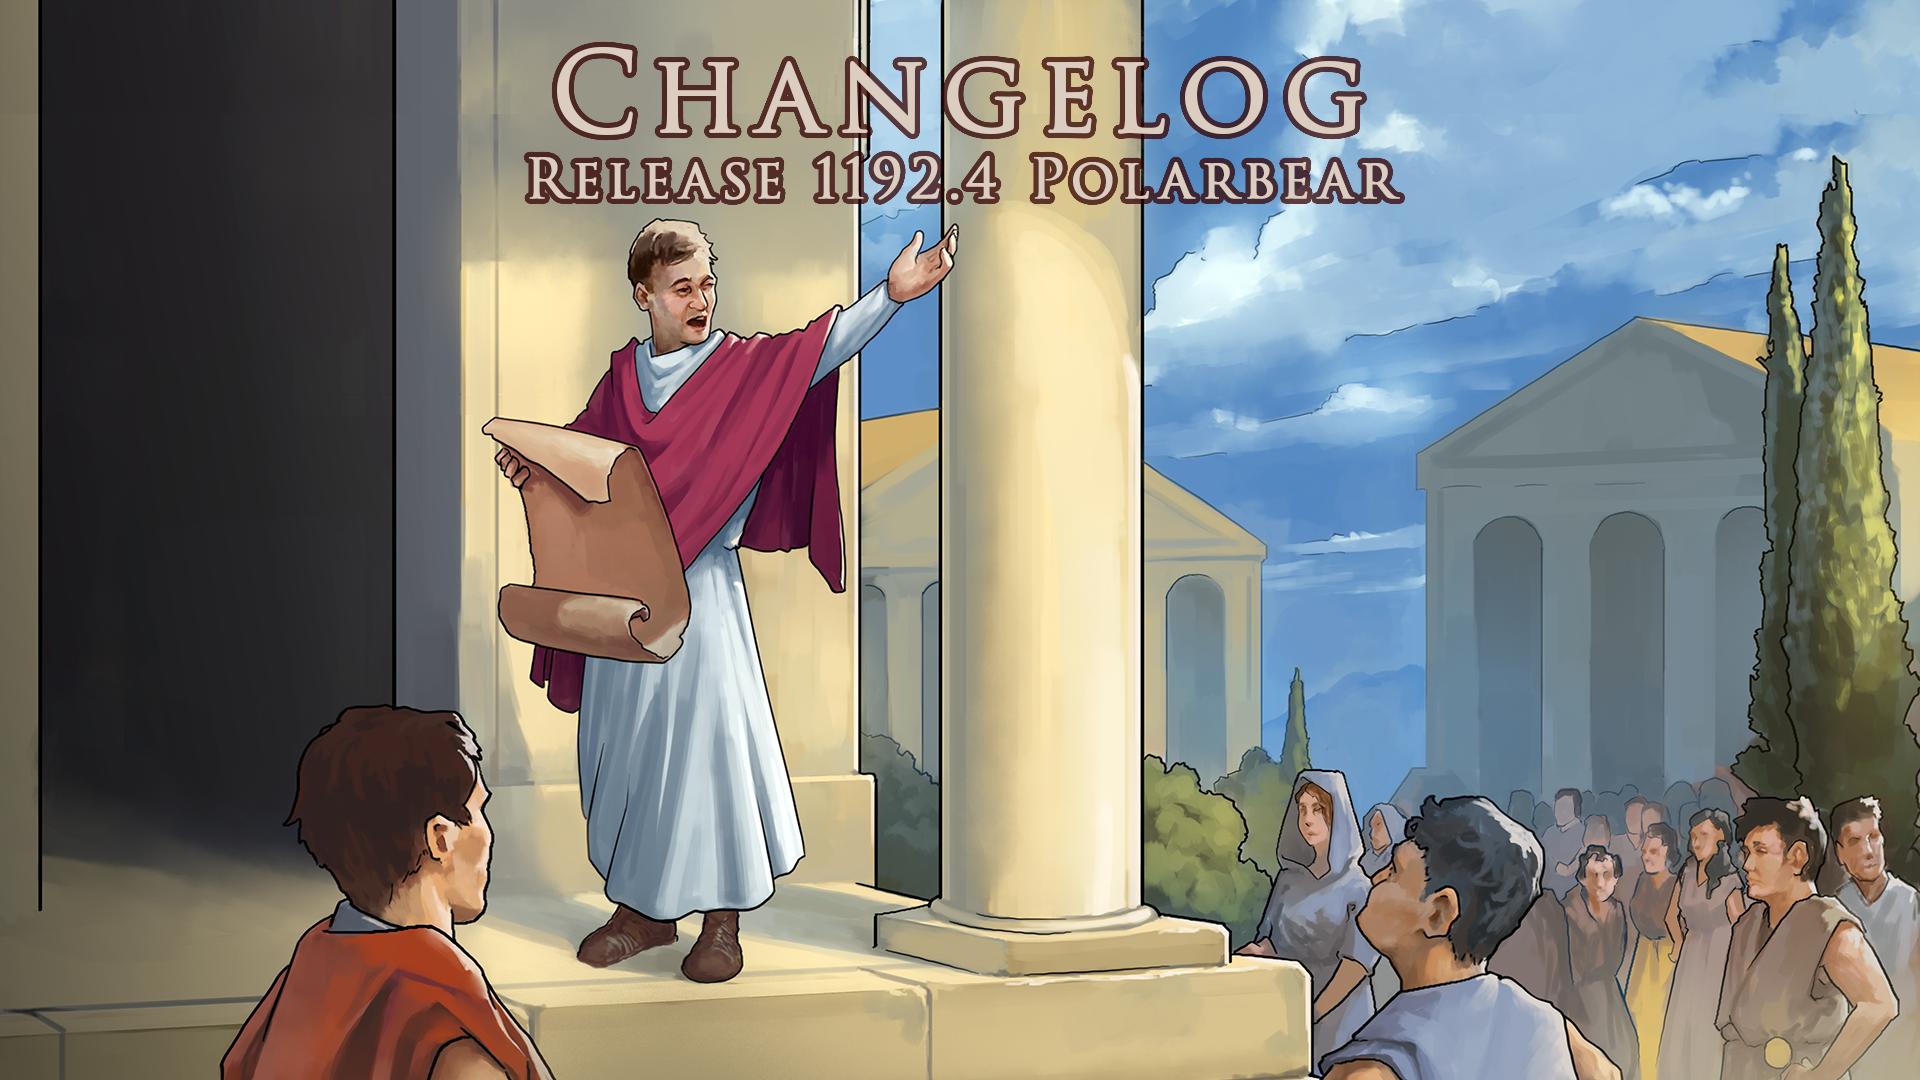 CHANGELOG ~ KEMASKINI POLARBEAR 1192.4